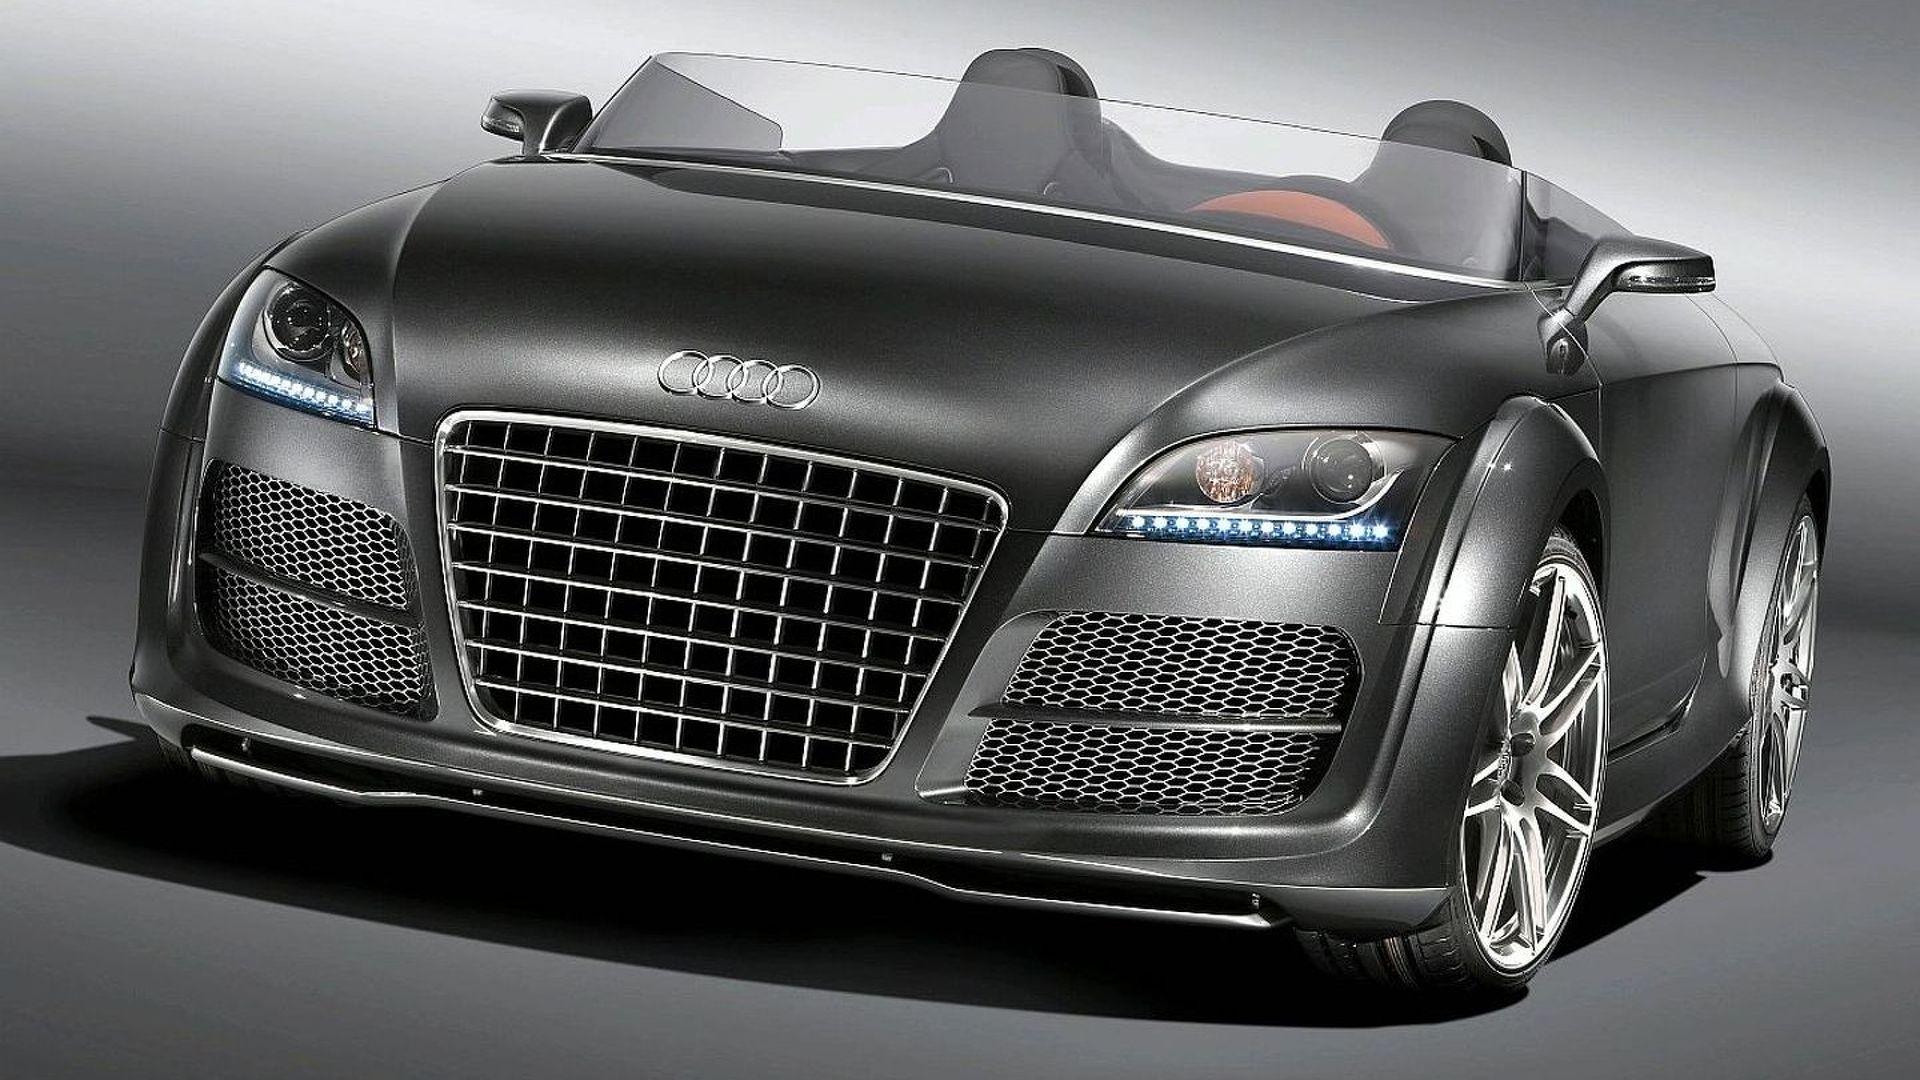 New Audi S Tronic Transmission - Audi latest model price